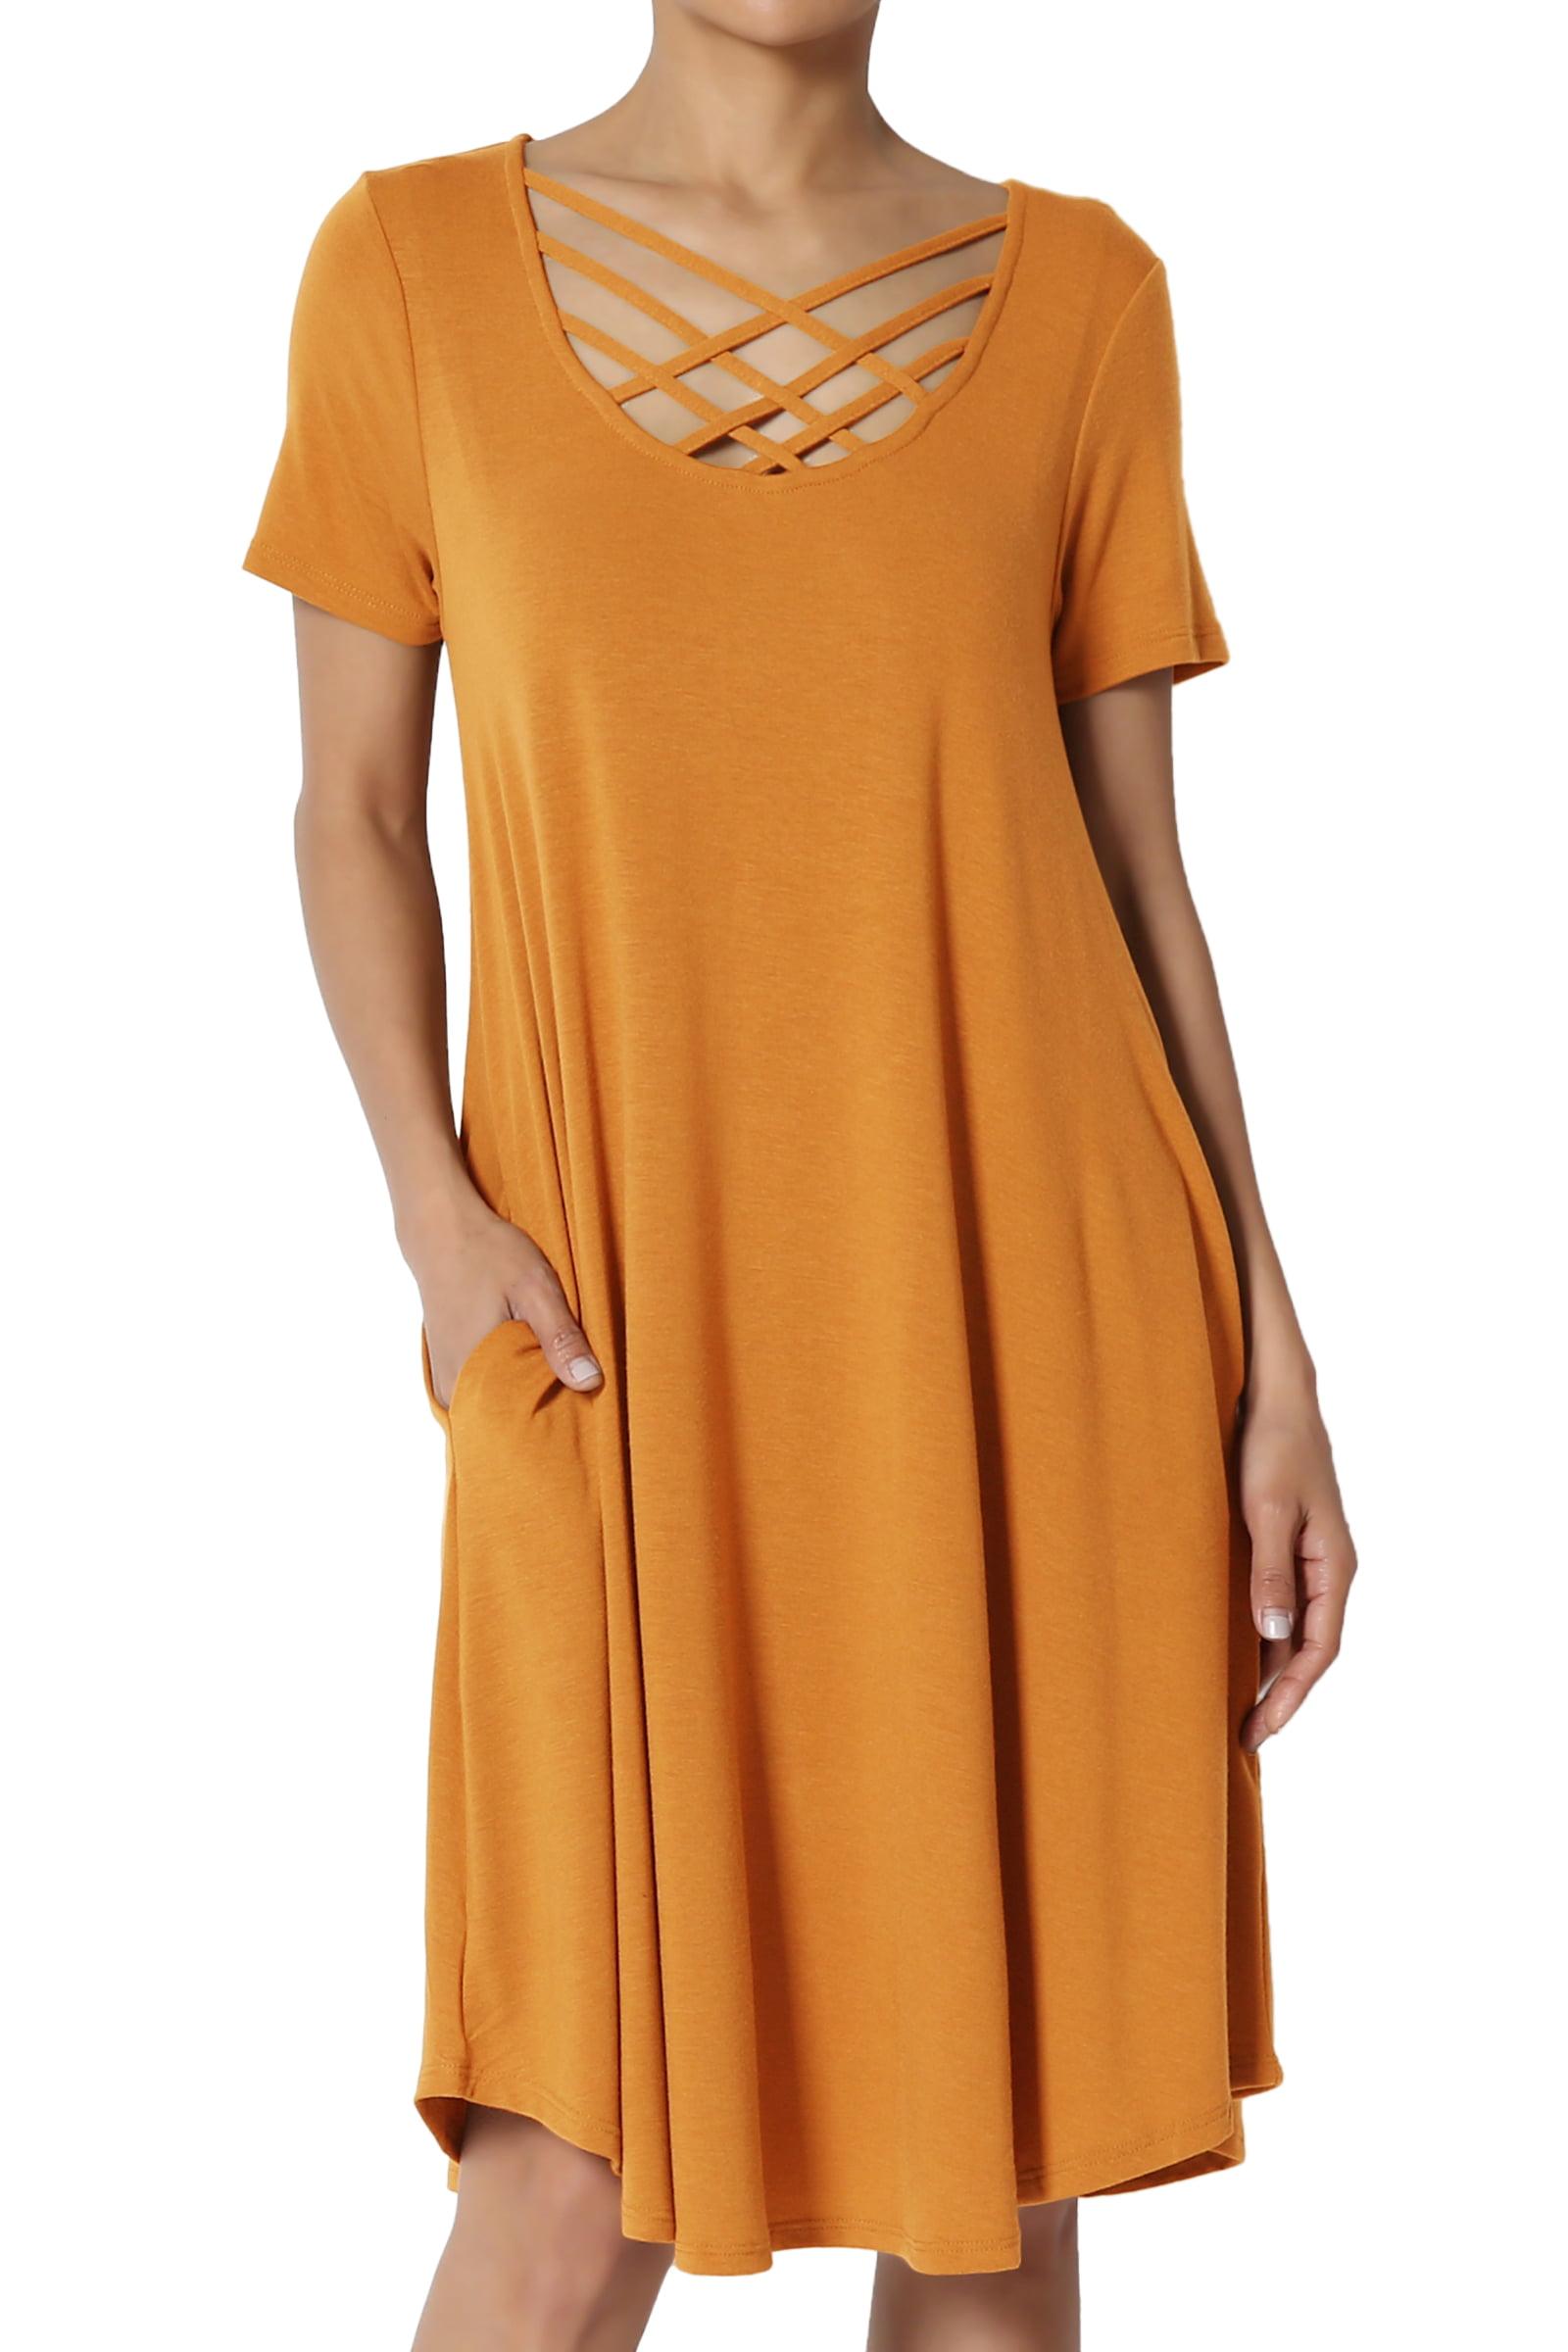 TheMogan Women's Crisscross Lattice Scoop Neck Short Sleeve Flare Pocket Tee Dress